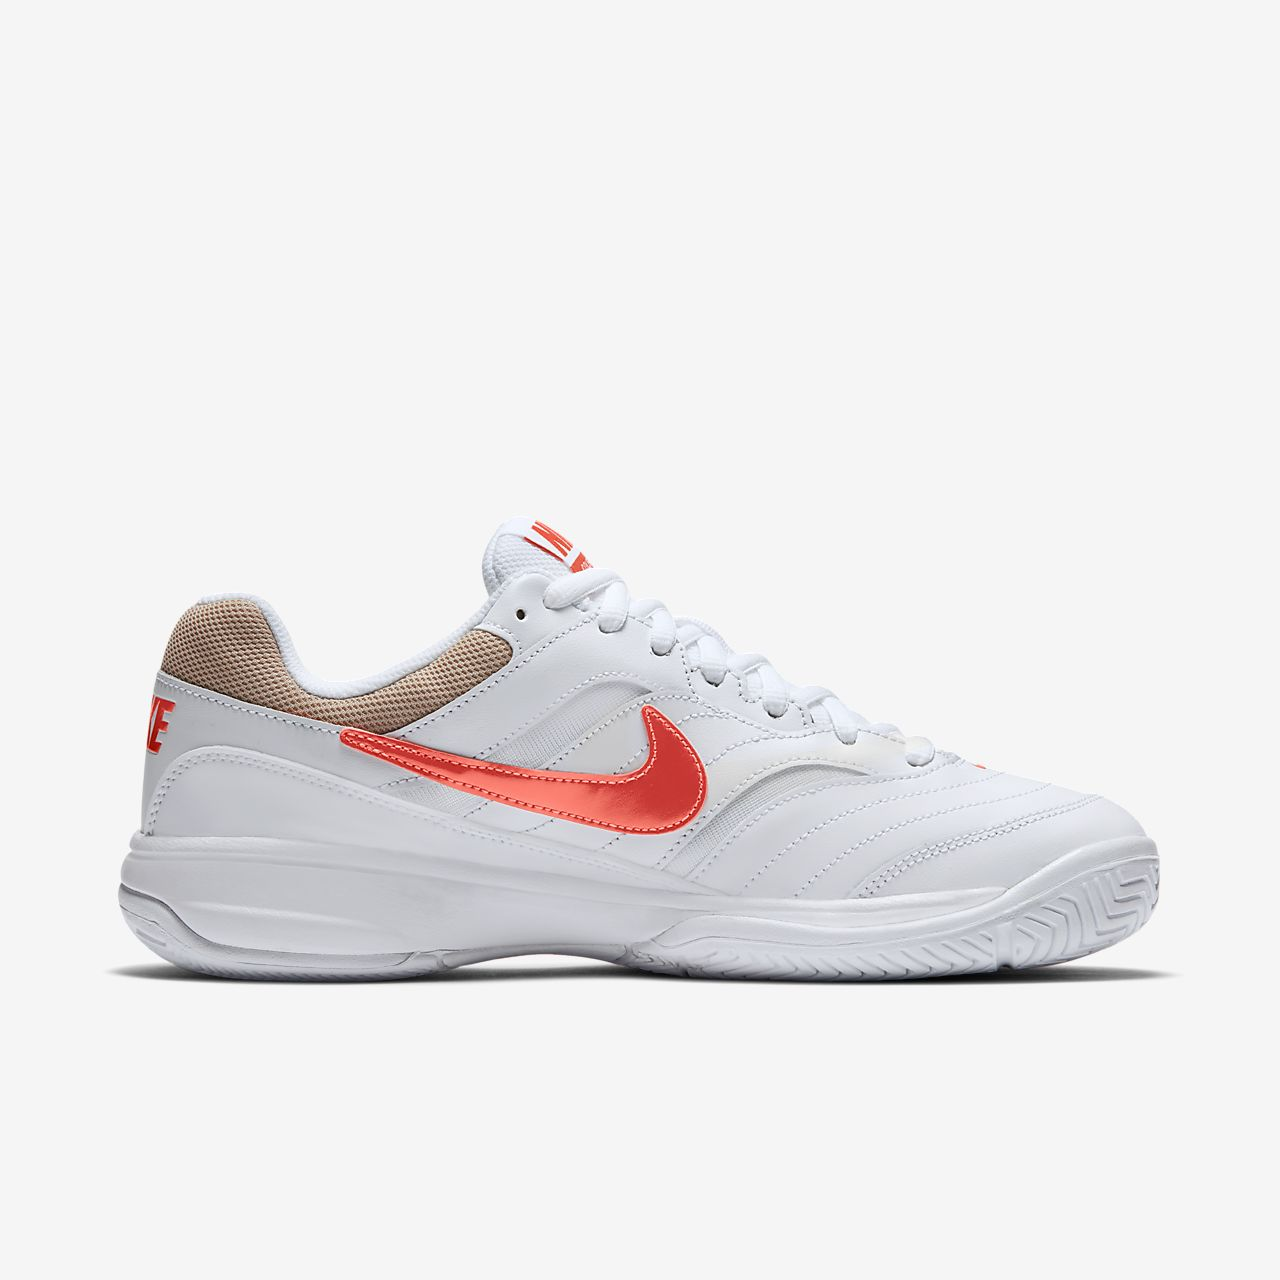 d43adebe96e1 NikeCourt Lite Hard Court tennissko til herre. Nike.com NO